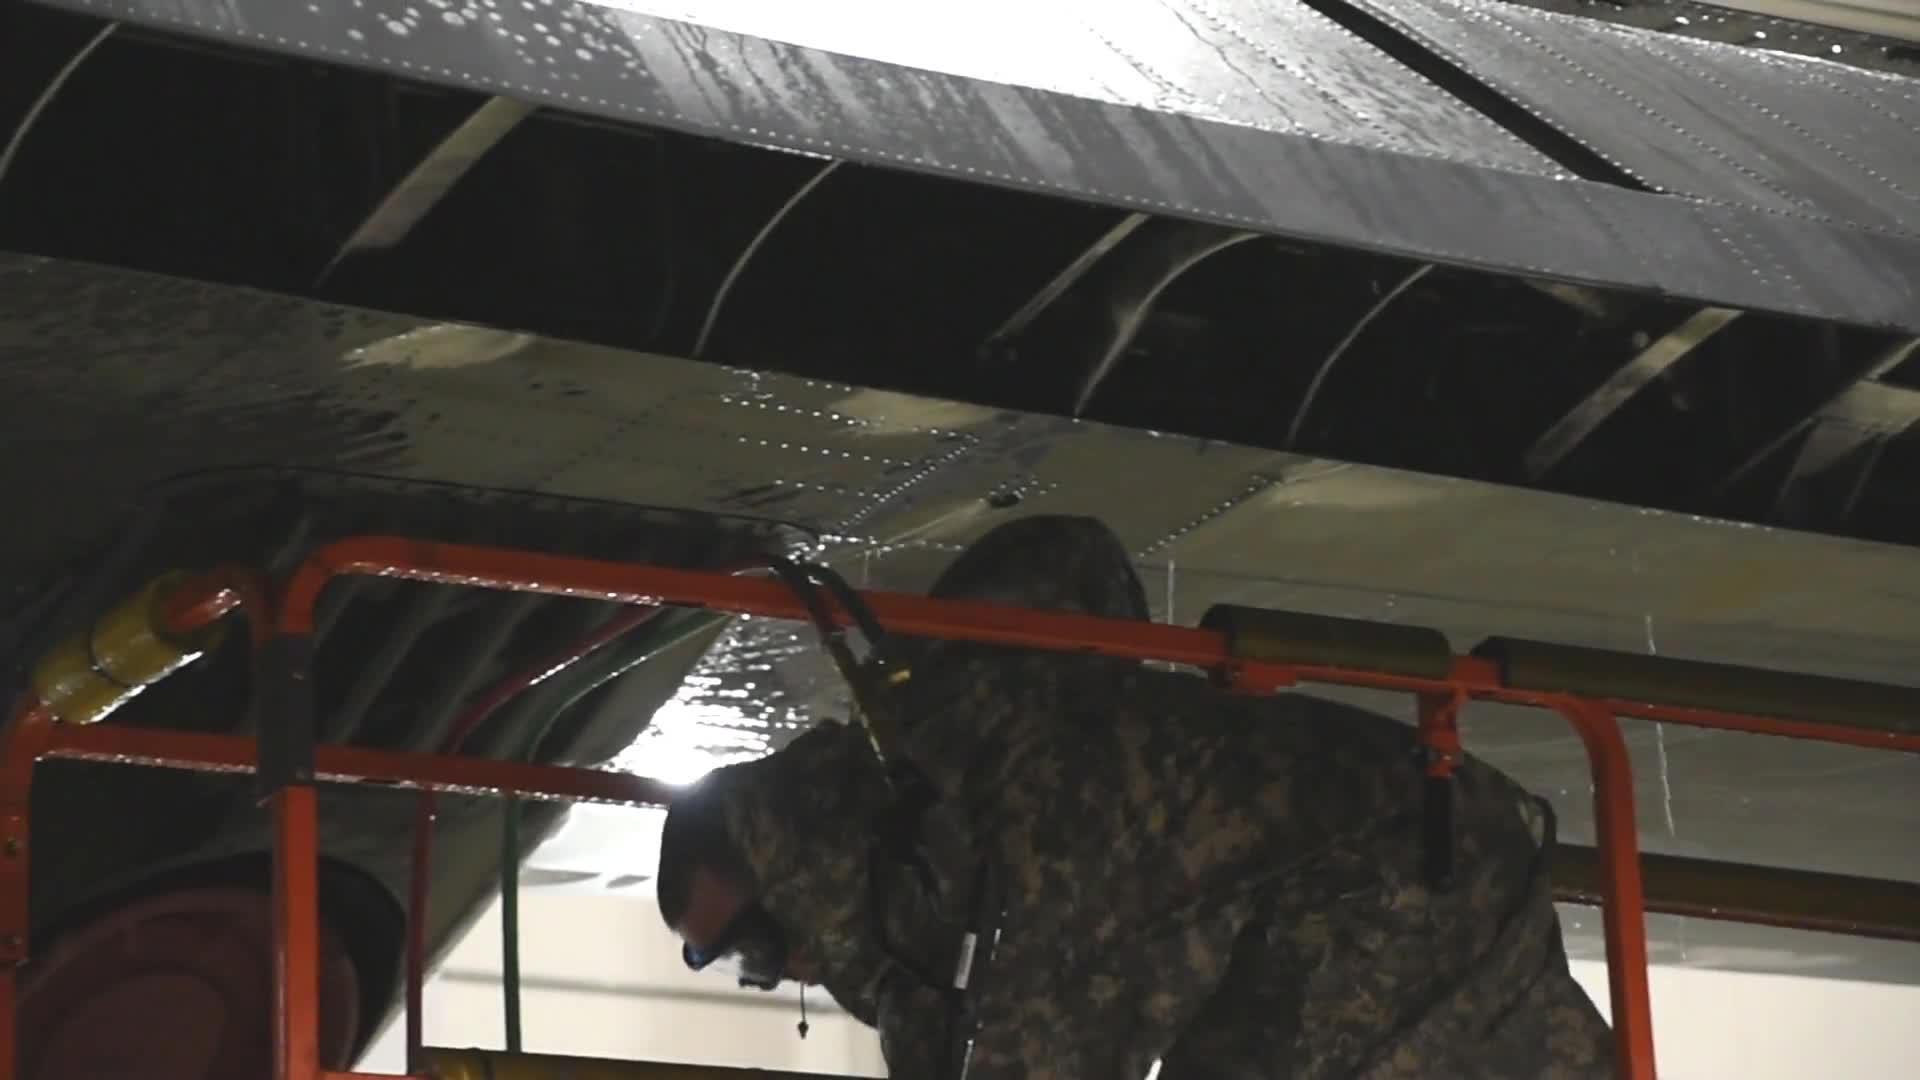 C-130大力神飞机清洗,还得人工洗,太落后了